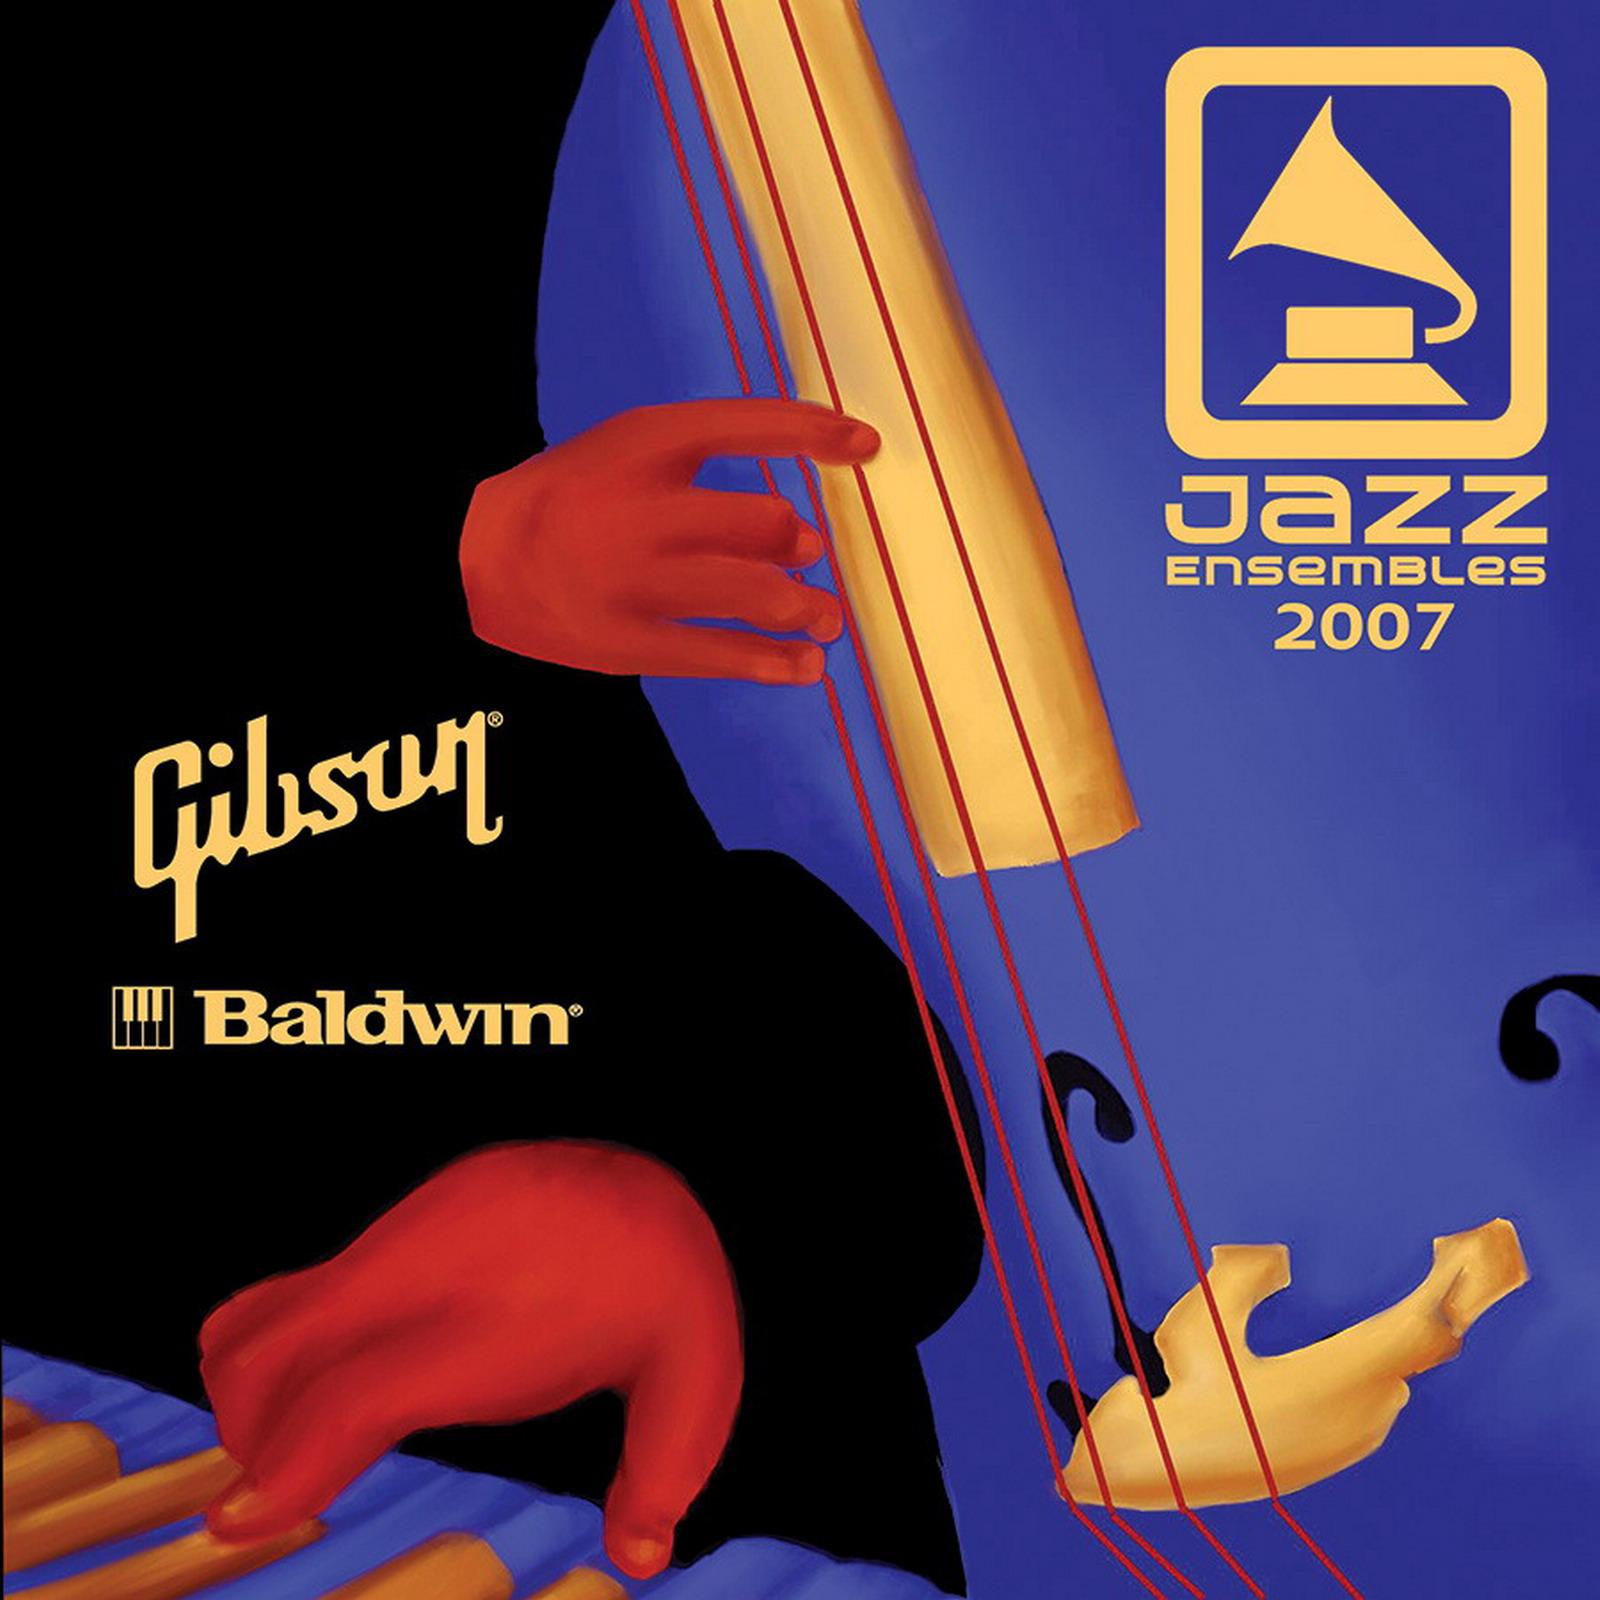 Gibson-baldwin Grammy Jazz Ensembles 2007 by GRAMMY Jazz Ensembles